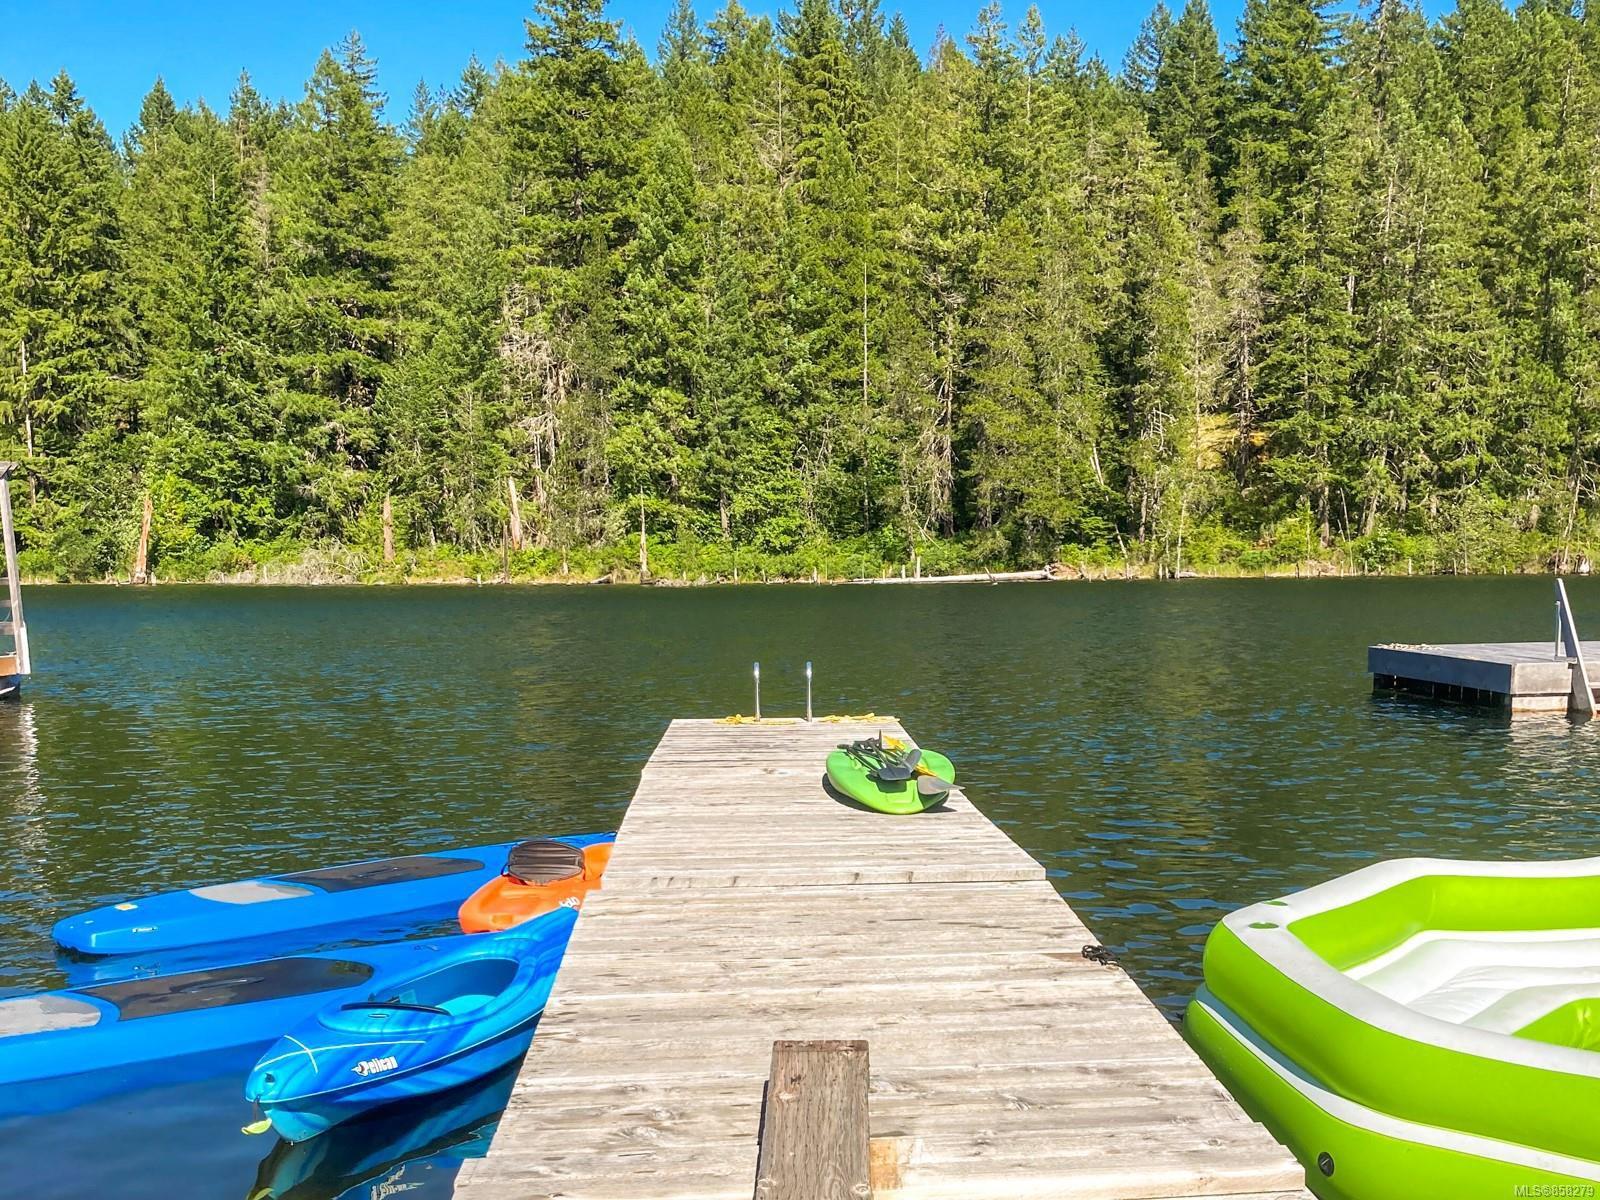 Main Photo: 7 10750 Central Lake Rd in : PA Sproat Lake Land for sale (Port Alberni)  : MLS®# 858279